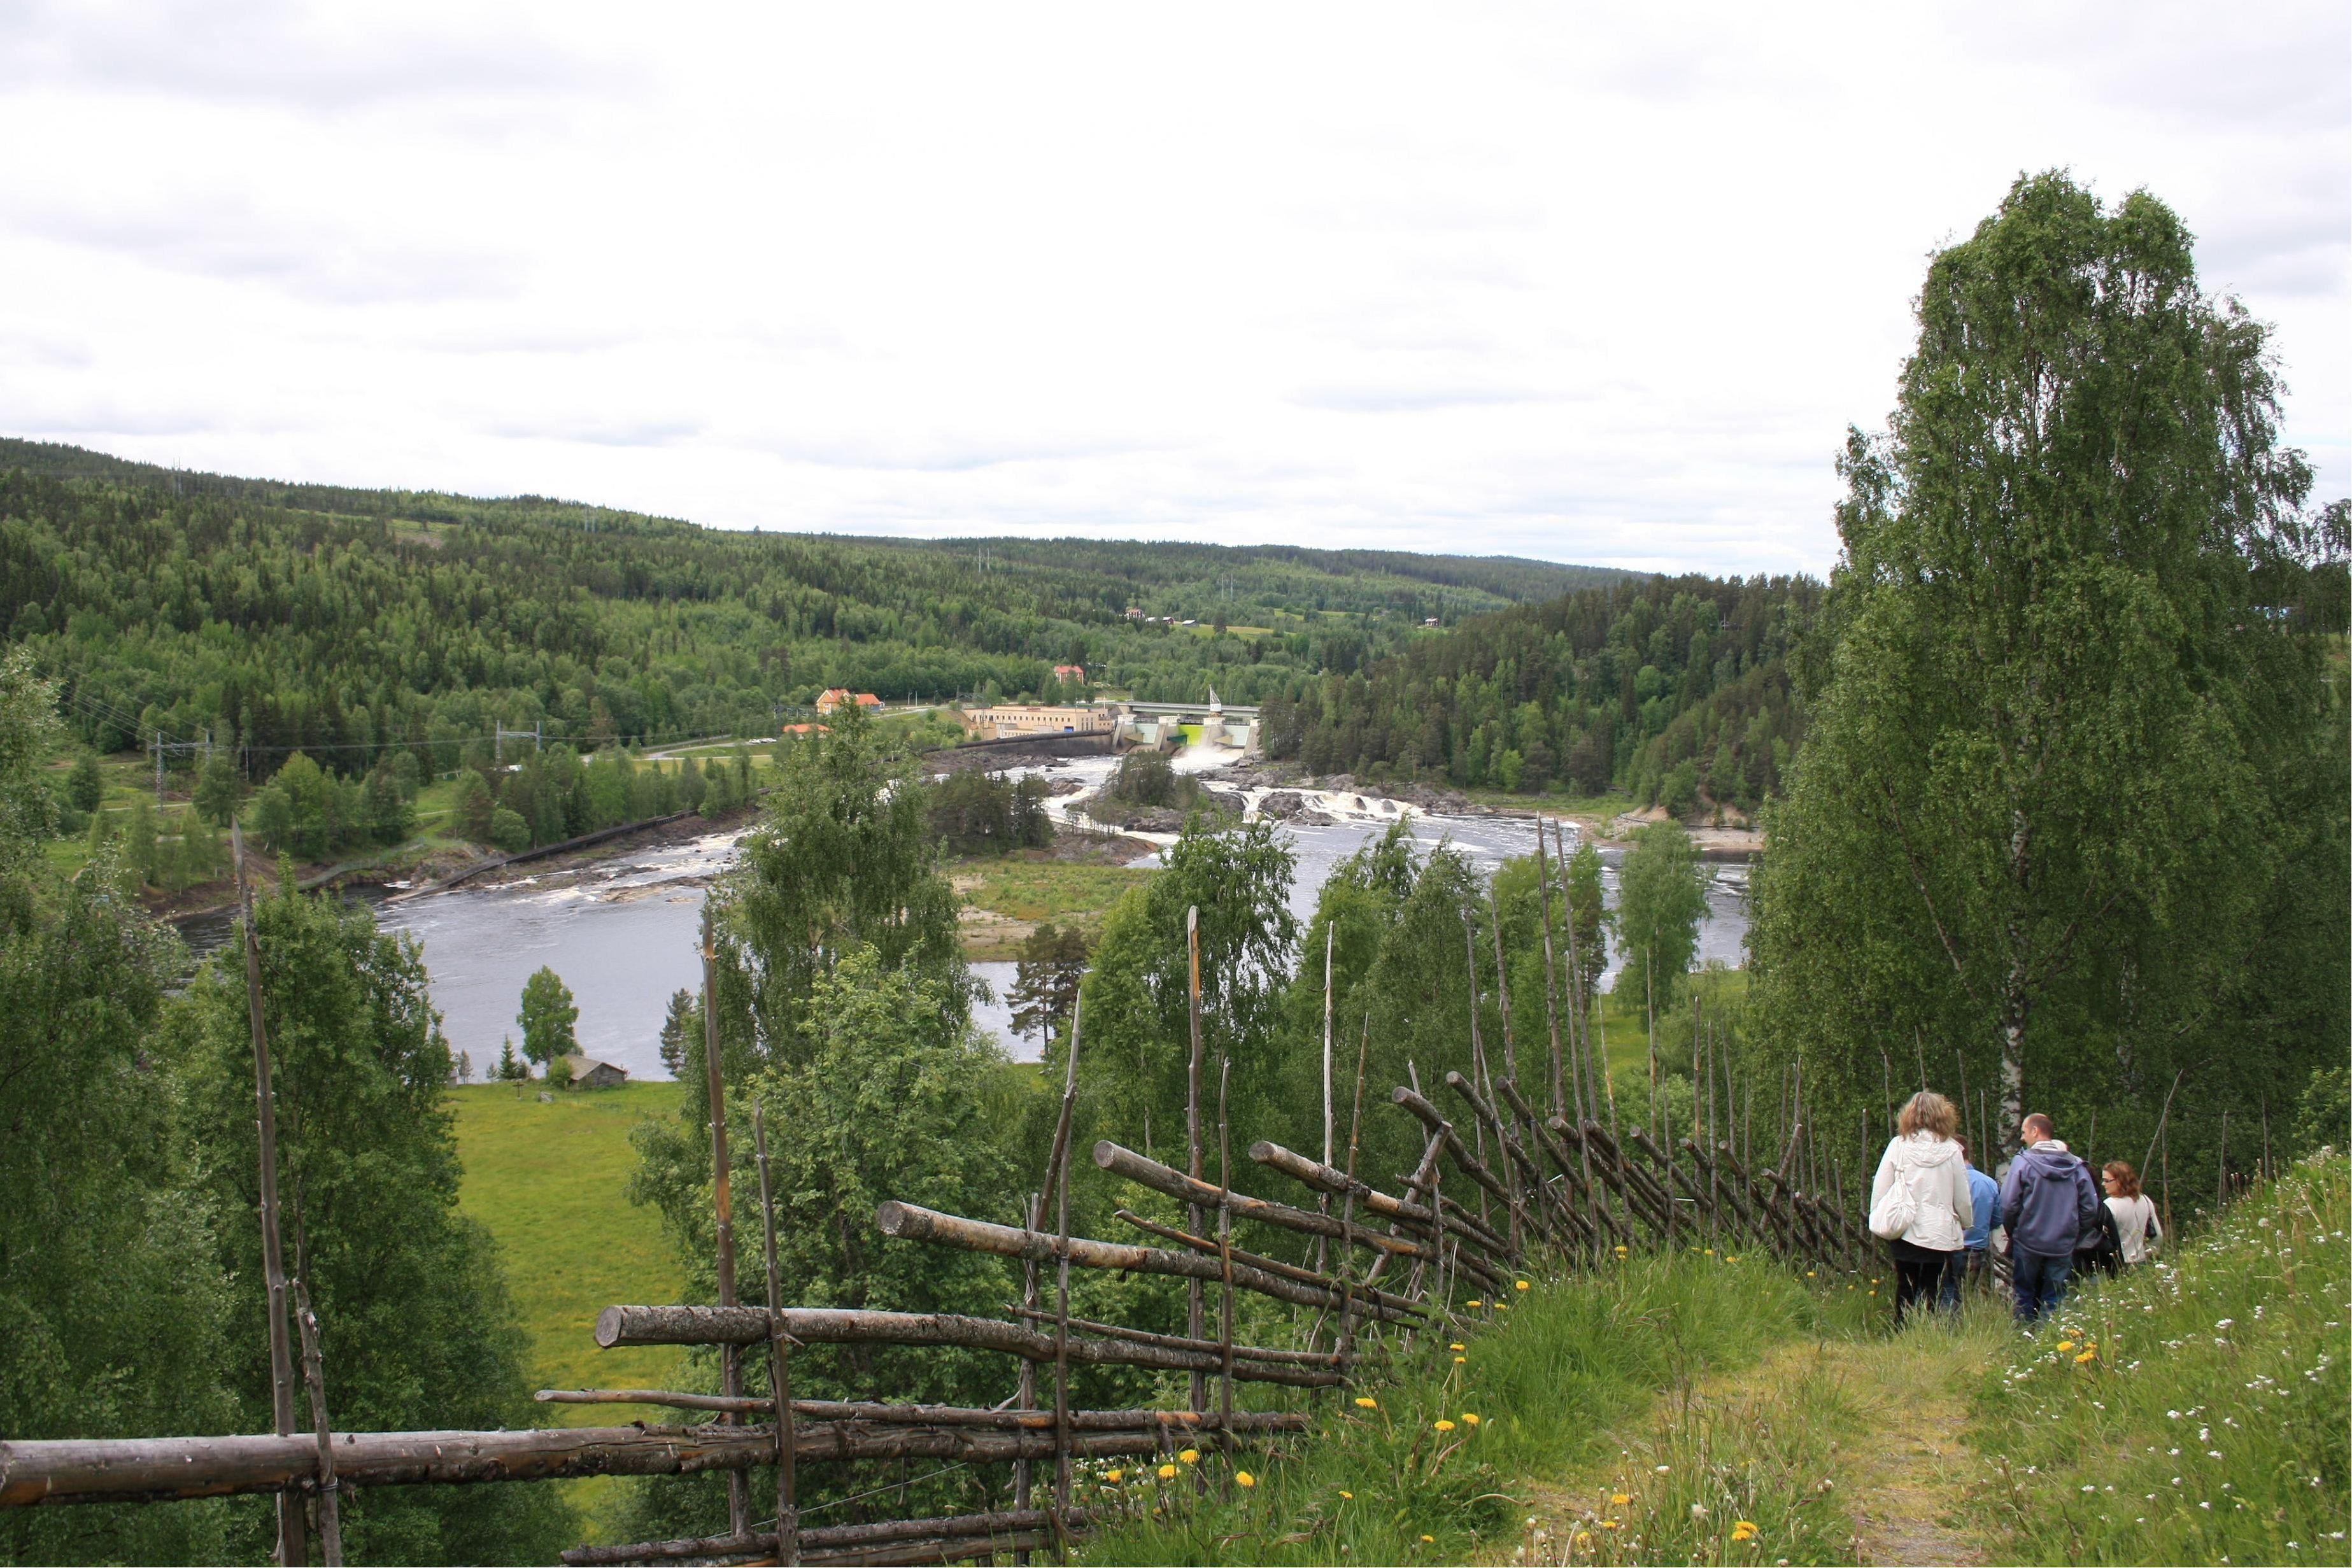 Foto. Leif Kårén, Ådalsleden vid Nämforsen